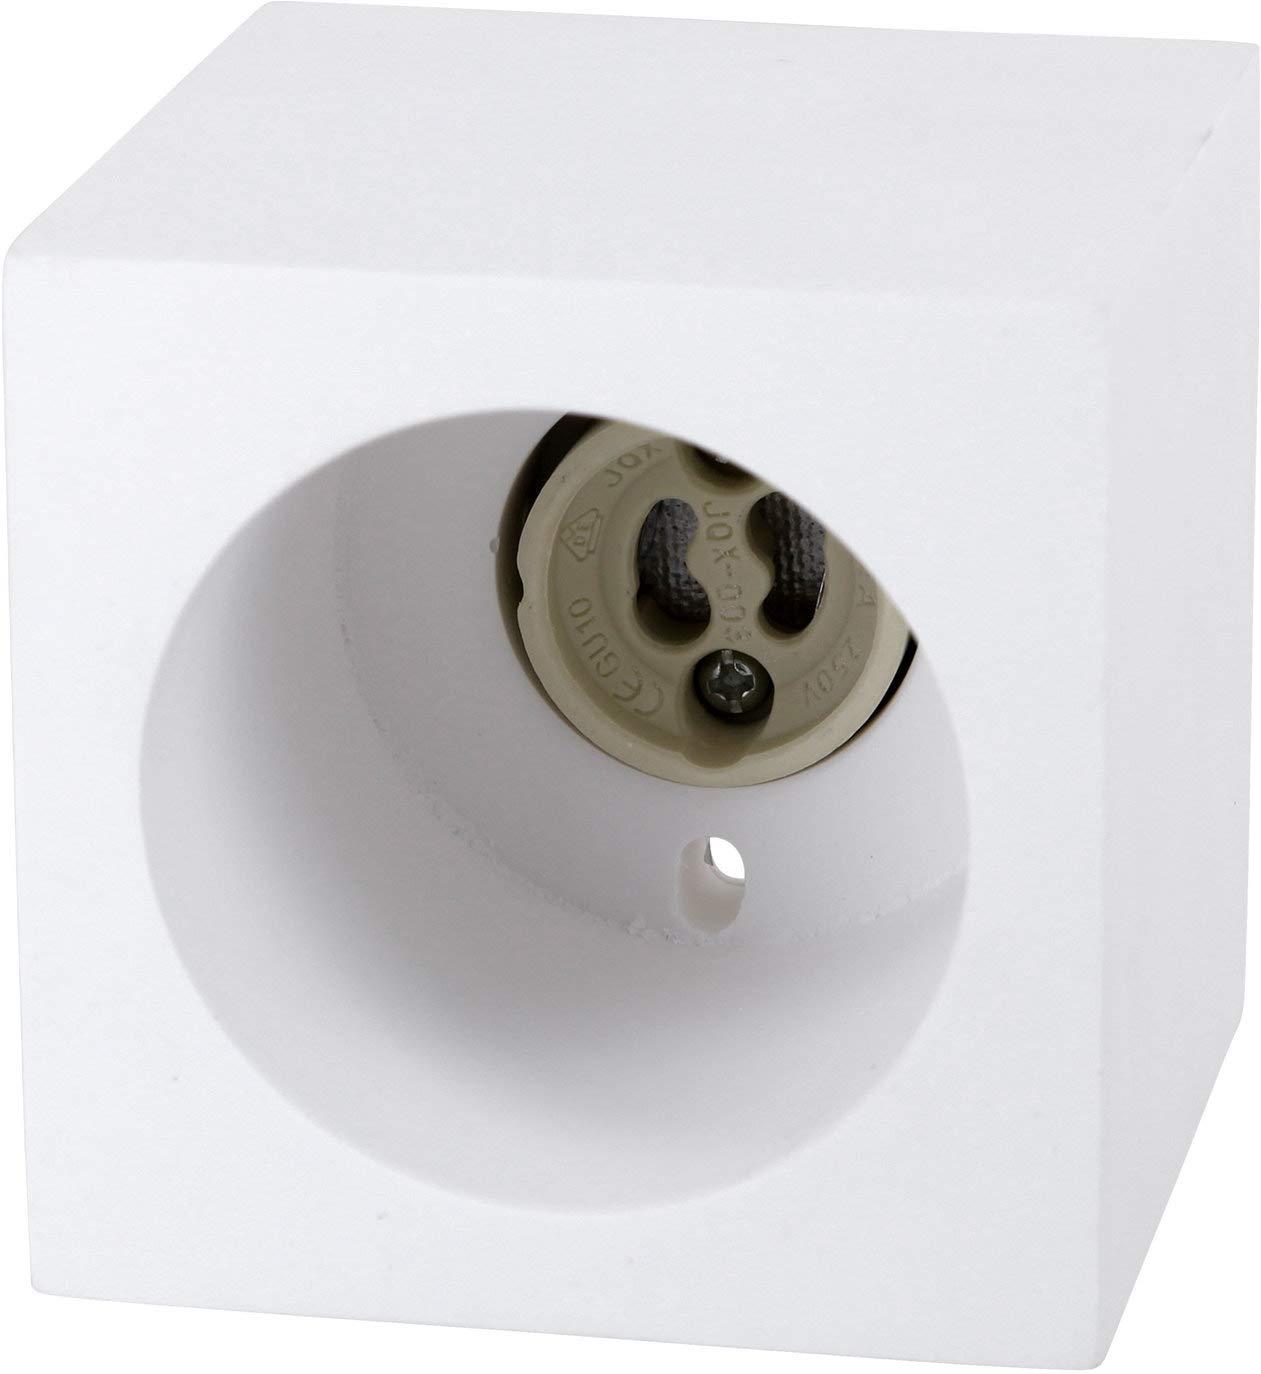 GU10, 230 V, cuadrado, 70 x 70 x 70 mm, di/ámetro de 30 mm Foco empotrable para techo